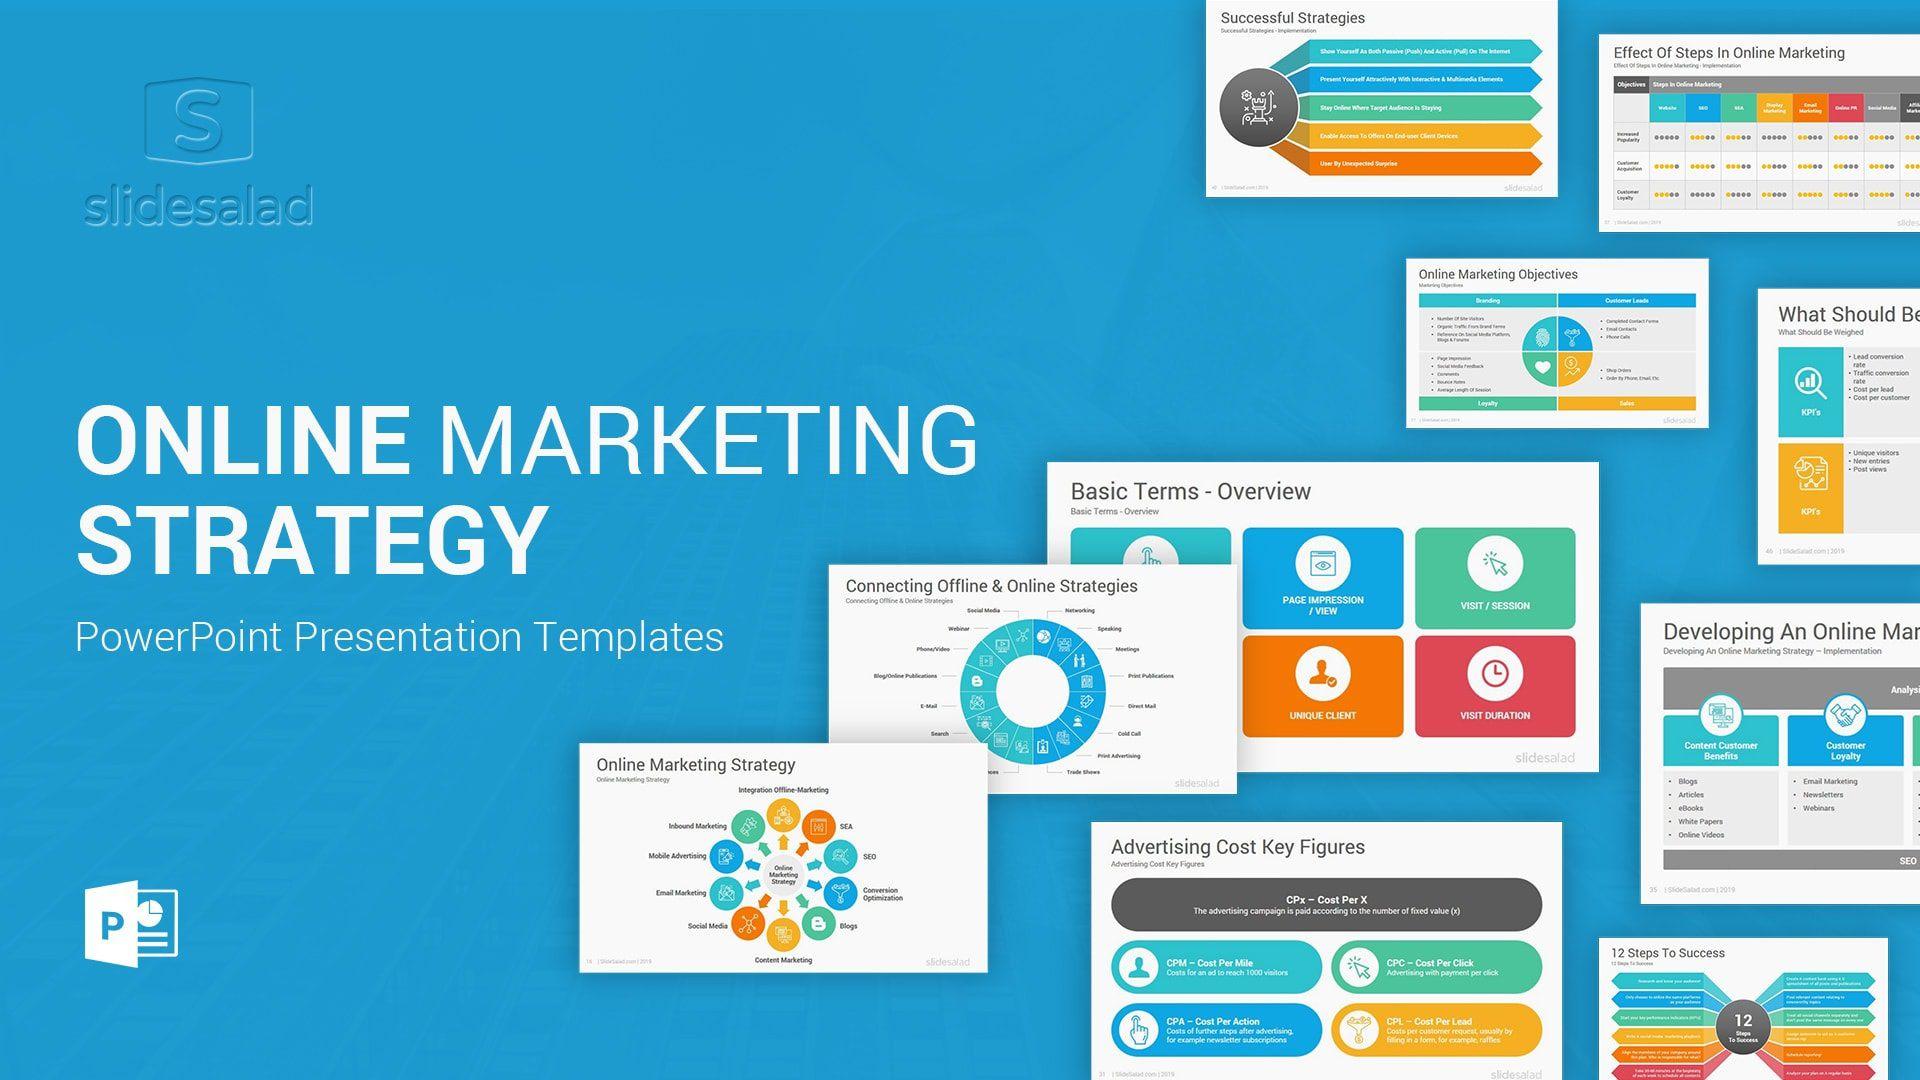 008 Awful Digital Marketing Plan Template Ppt High Def  Presentation Free SlideshareFull